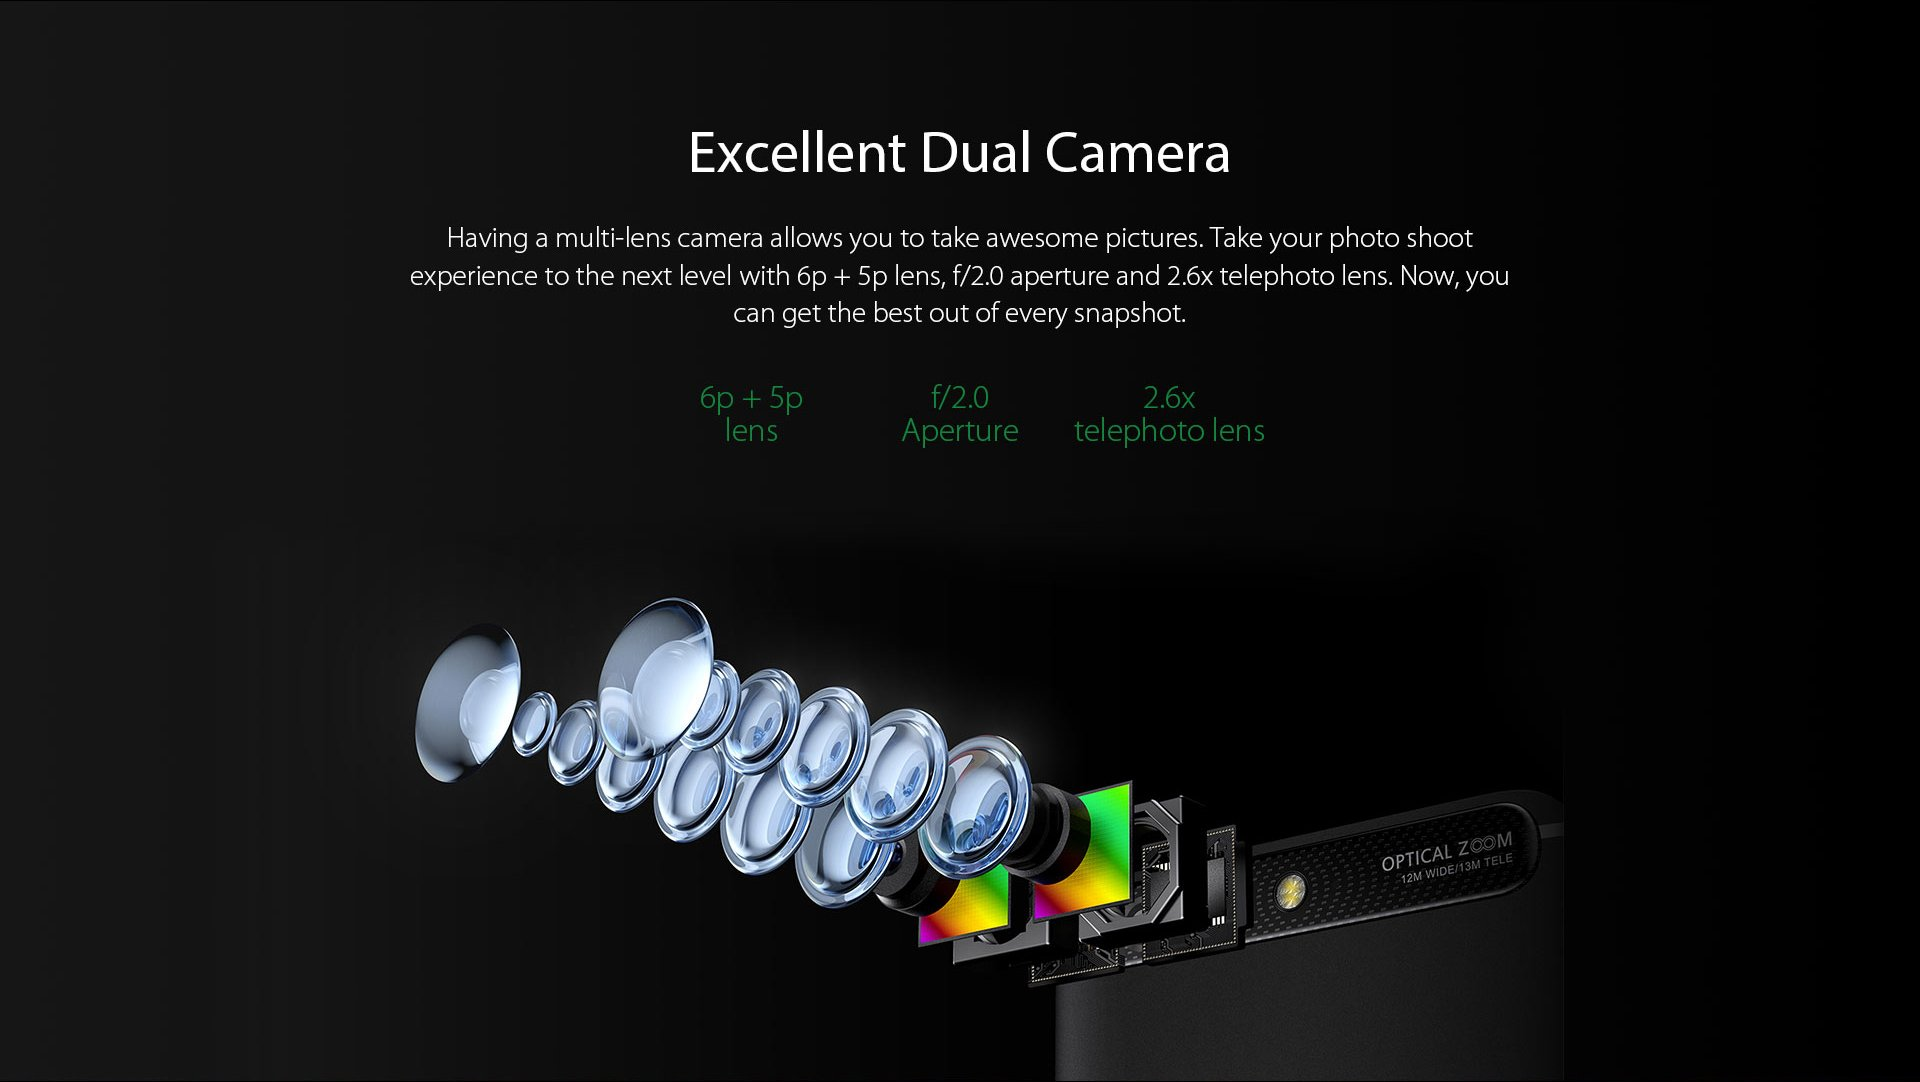 Infinix zero5 dual camera